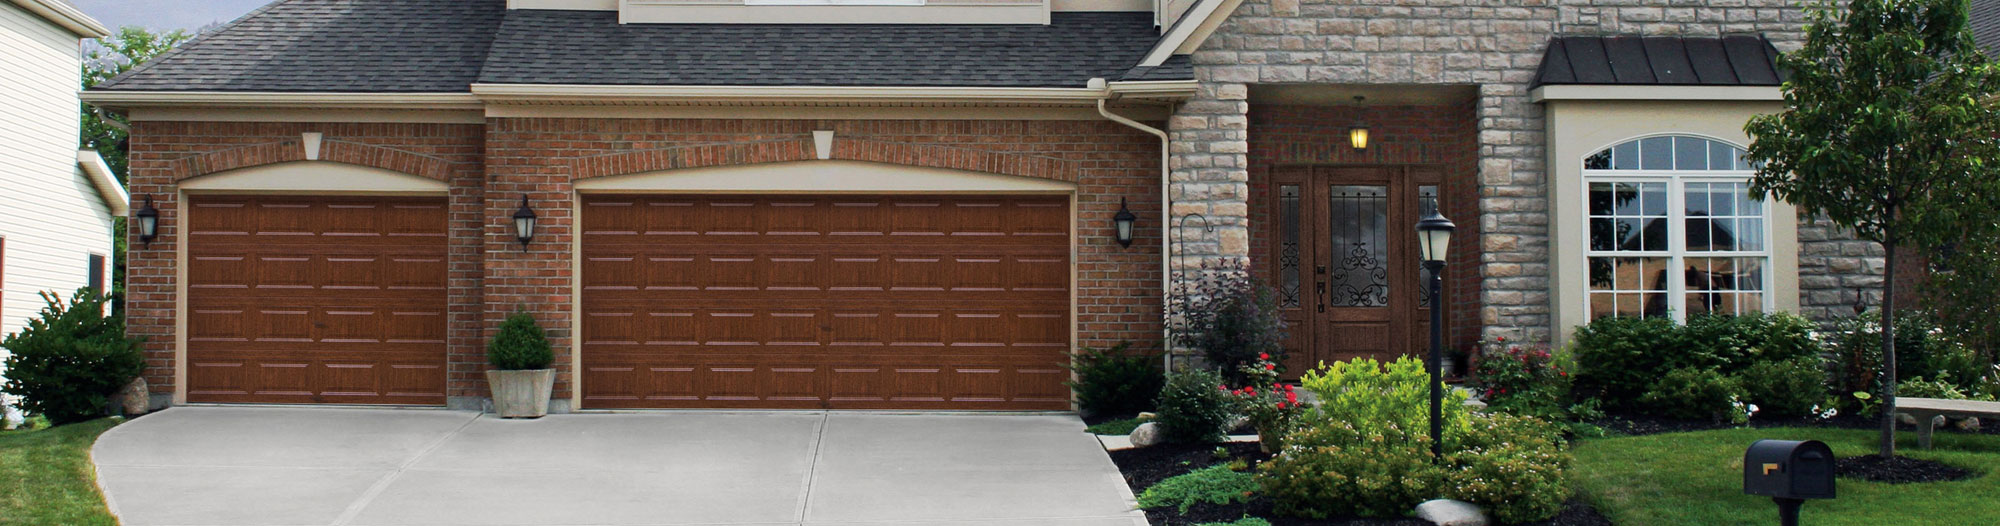 How To Increase Garage Door Security Quality Overhead Door Make Your Own Beautiful  HD Wallpapers, Images Over 1000+ [ralydesign.ml]